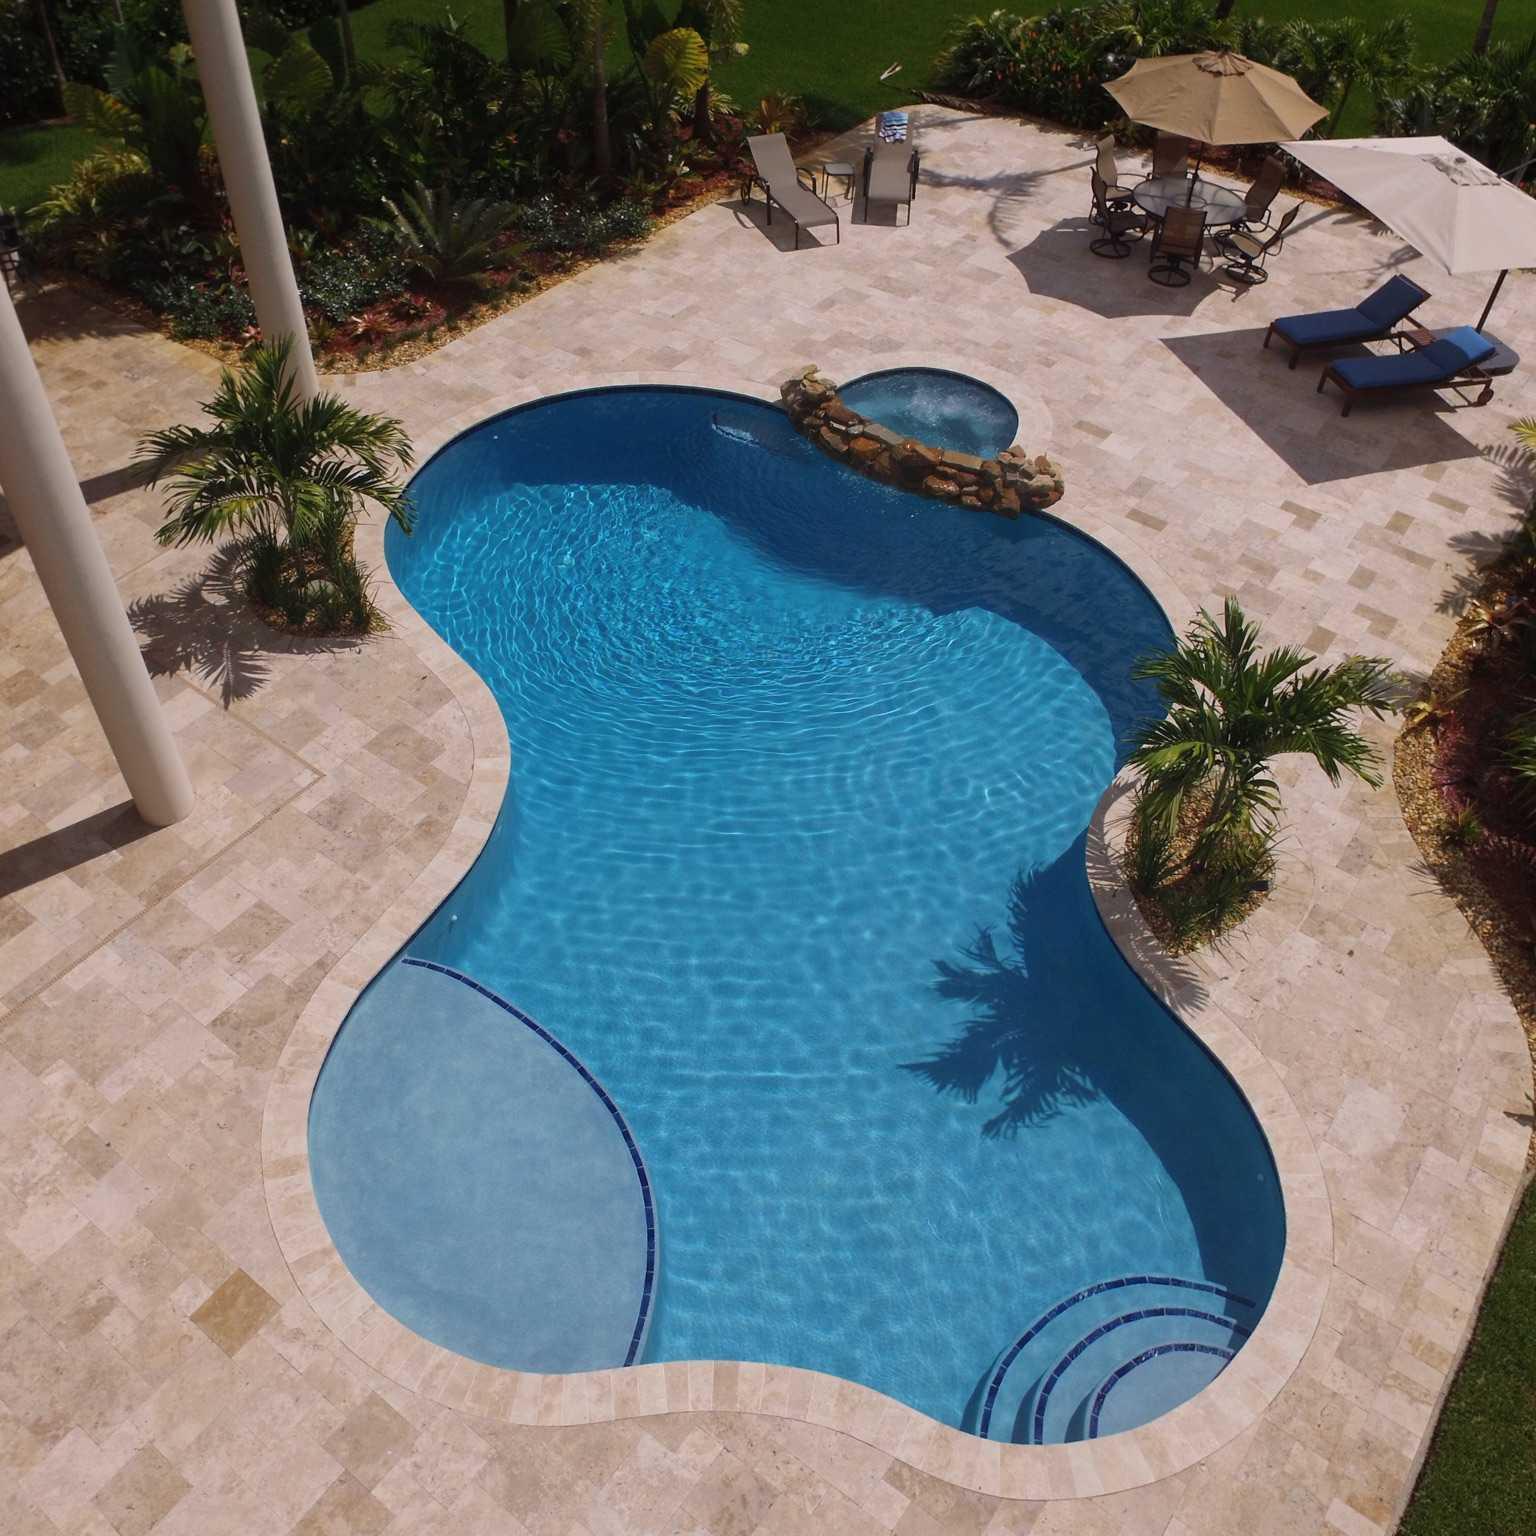 Bluewater Pool Remodeling/Repair & Leak Detection